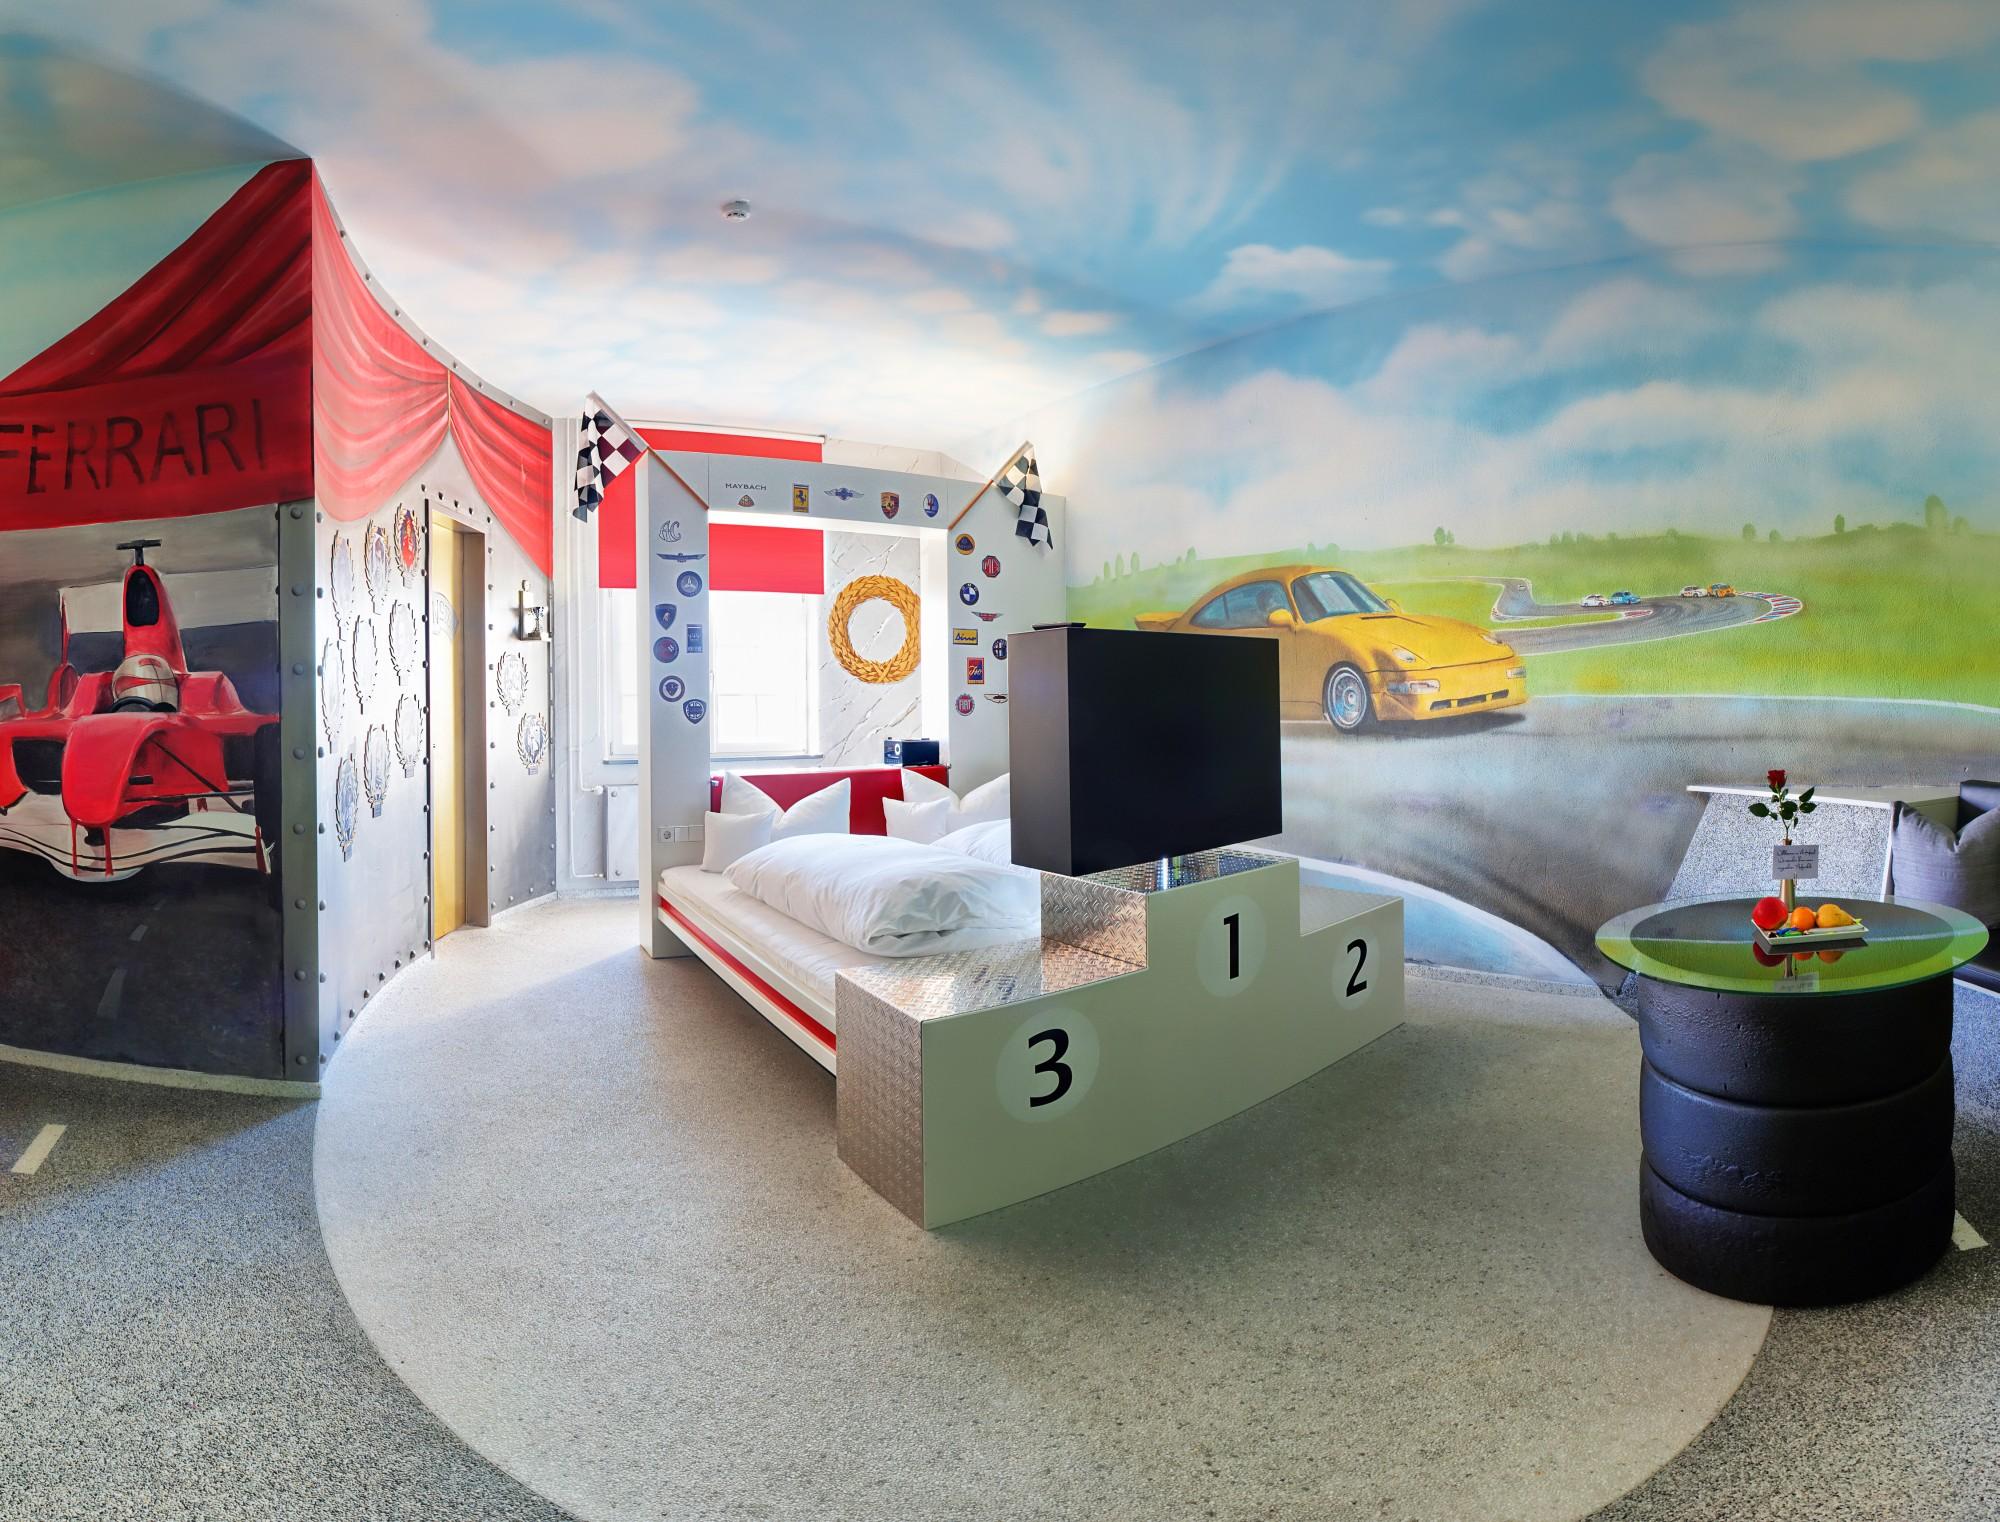 v8 hotel s automobilskim dizajnom auto fun zanimljivosti vidiauto vidiauto. Black Bedroom Furniture Sets. Home Design Ideas